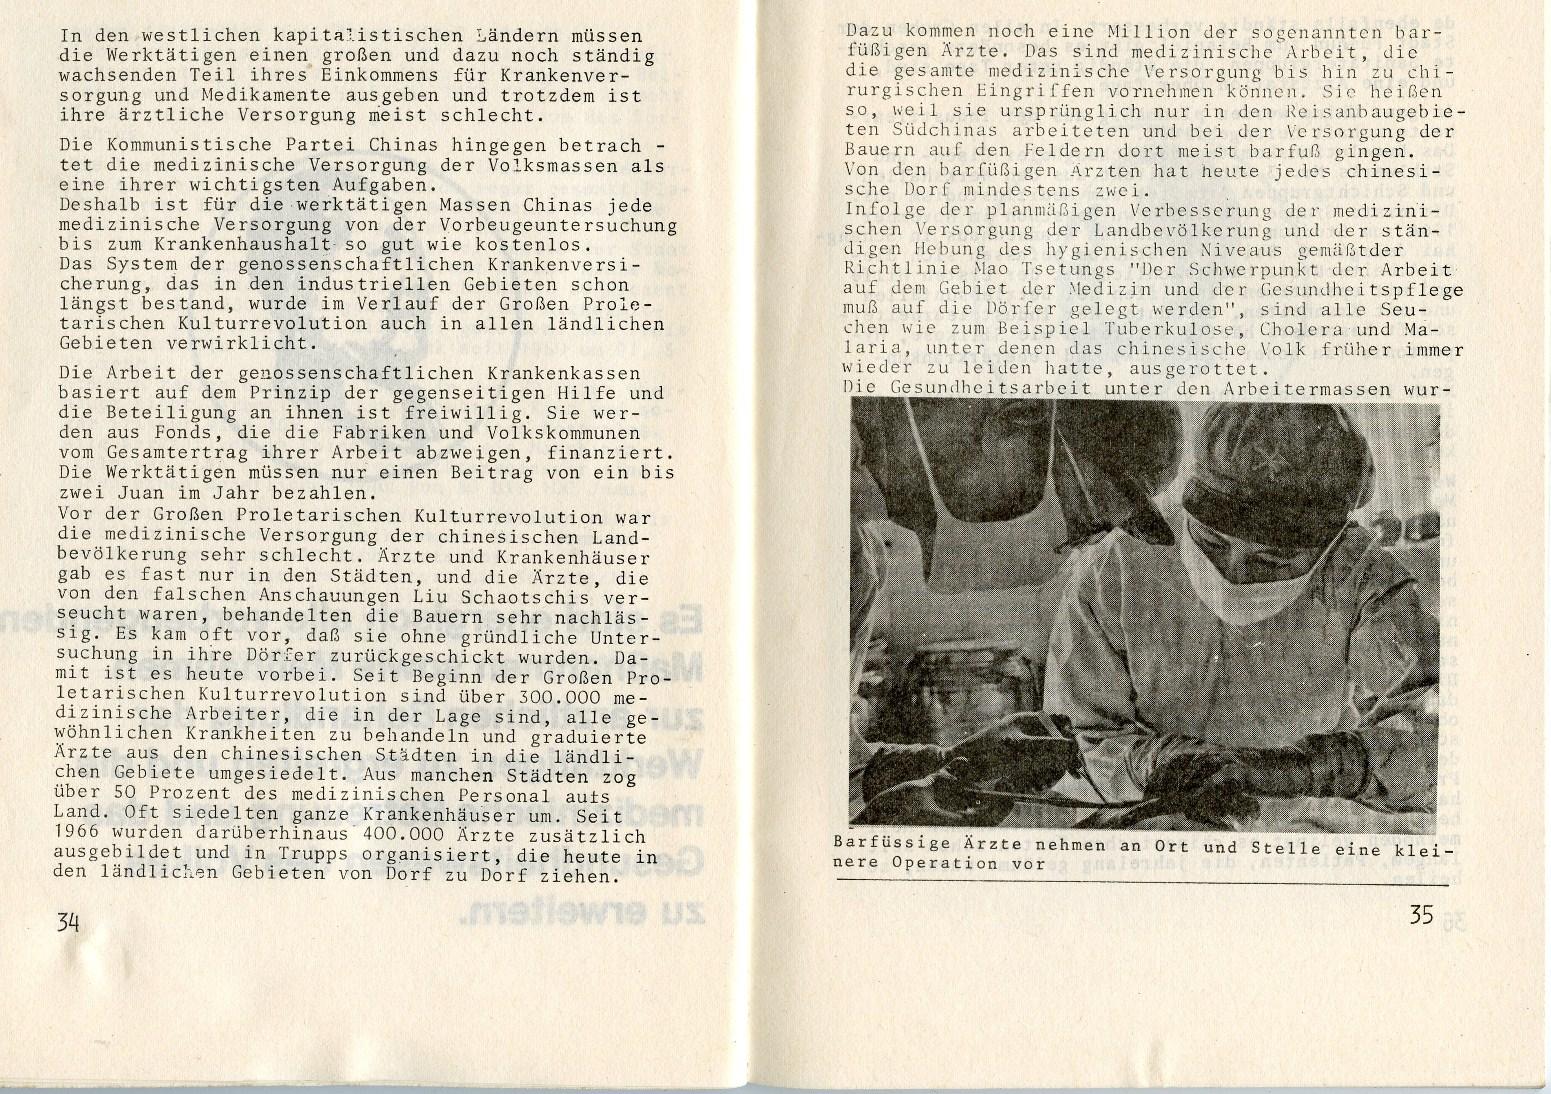 ZB_KPChinas_1971_19